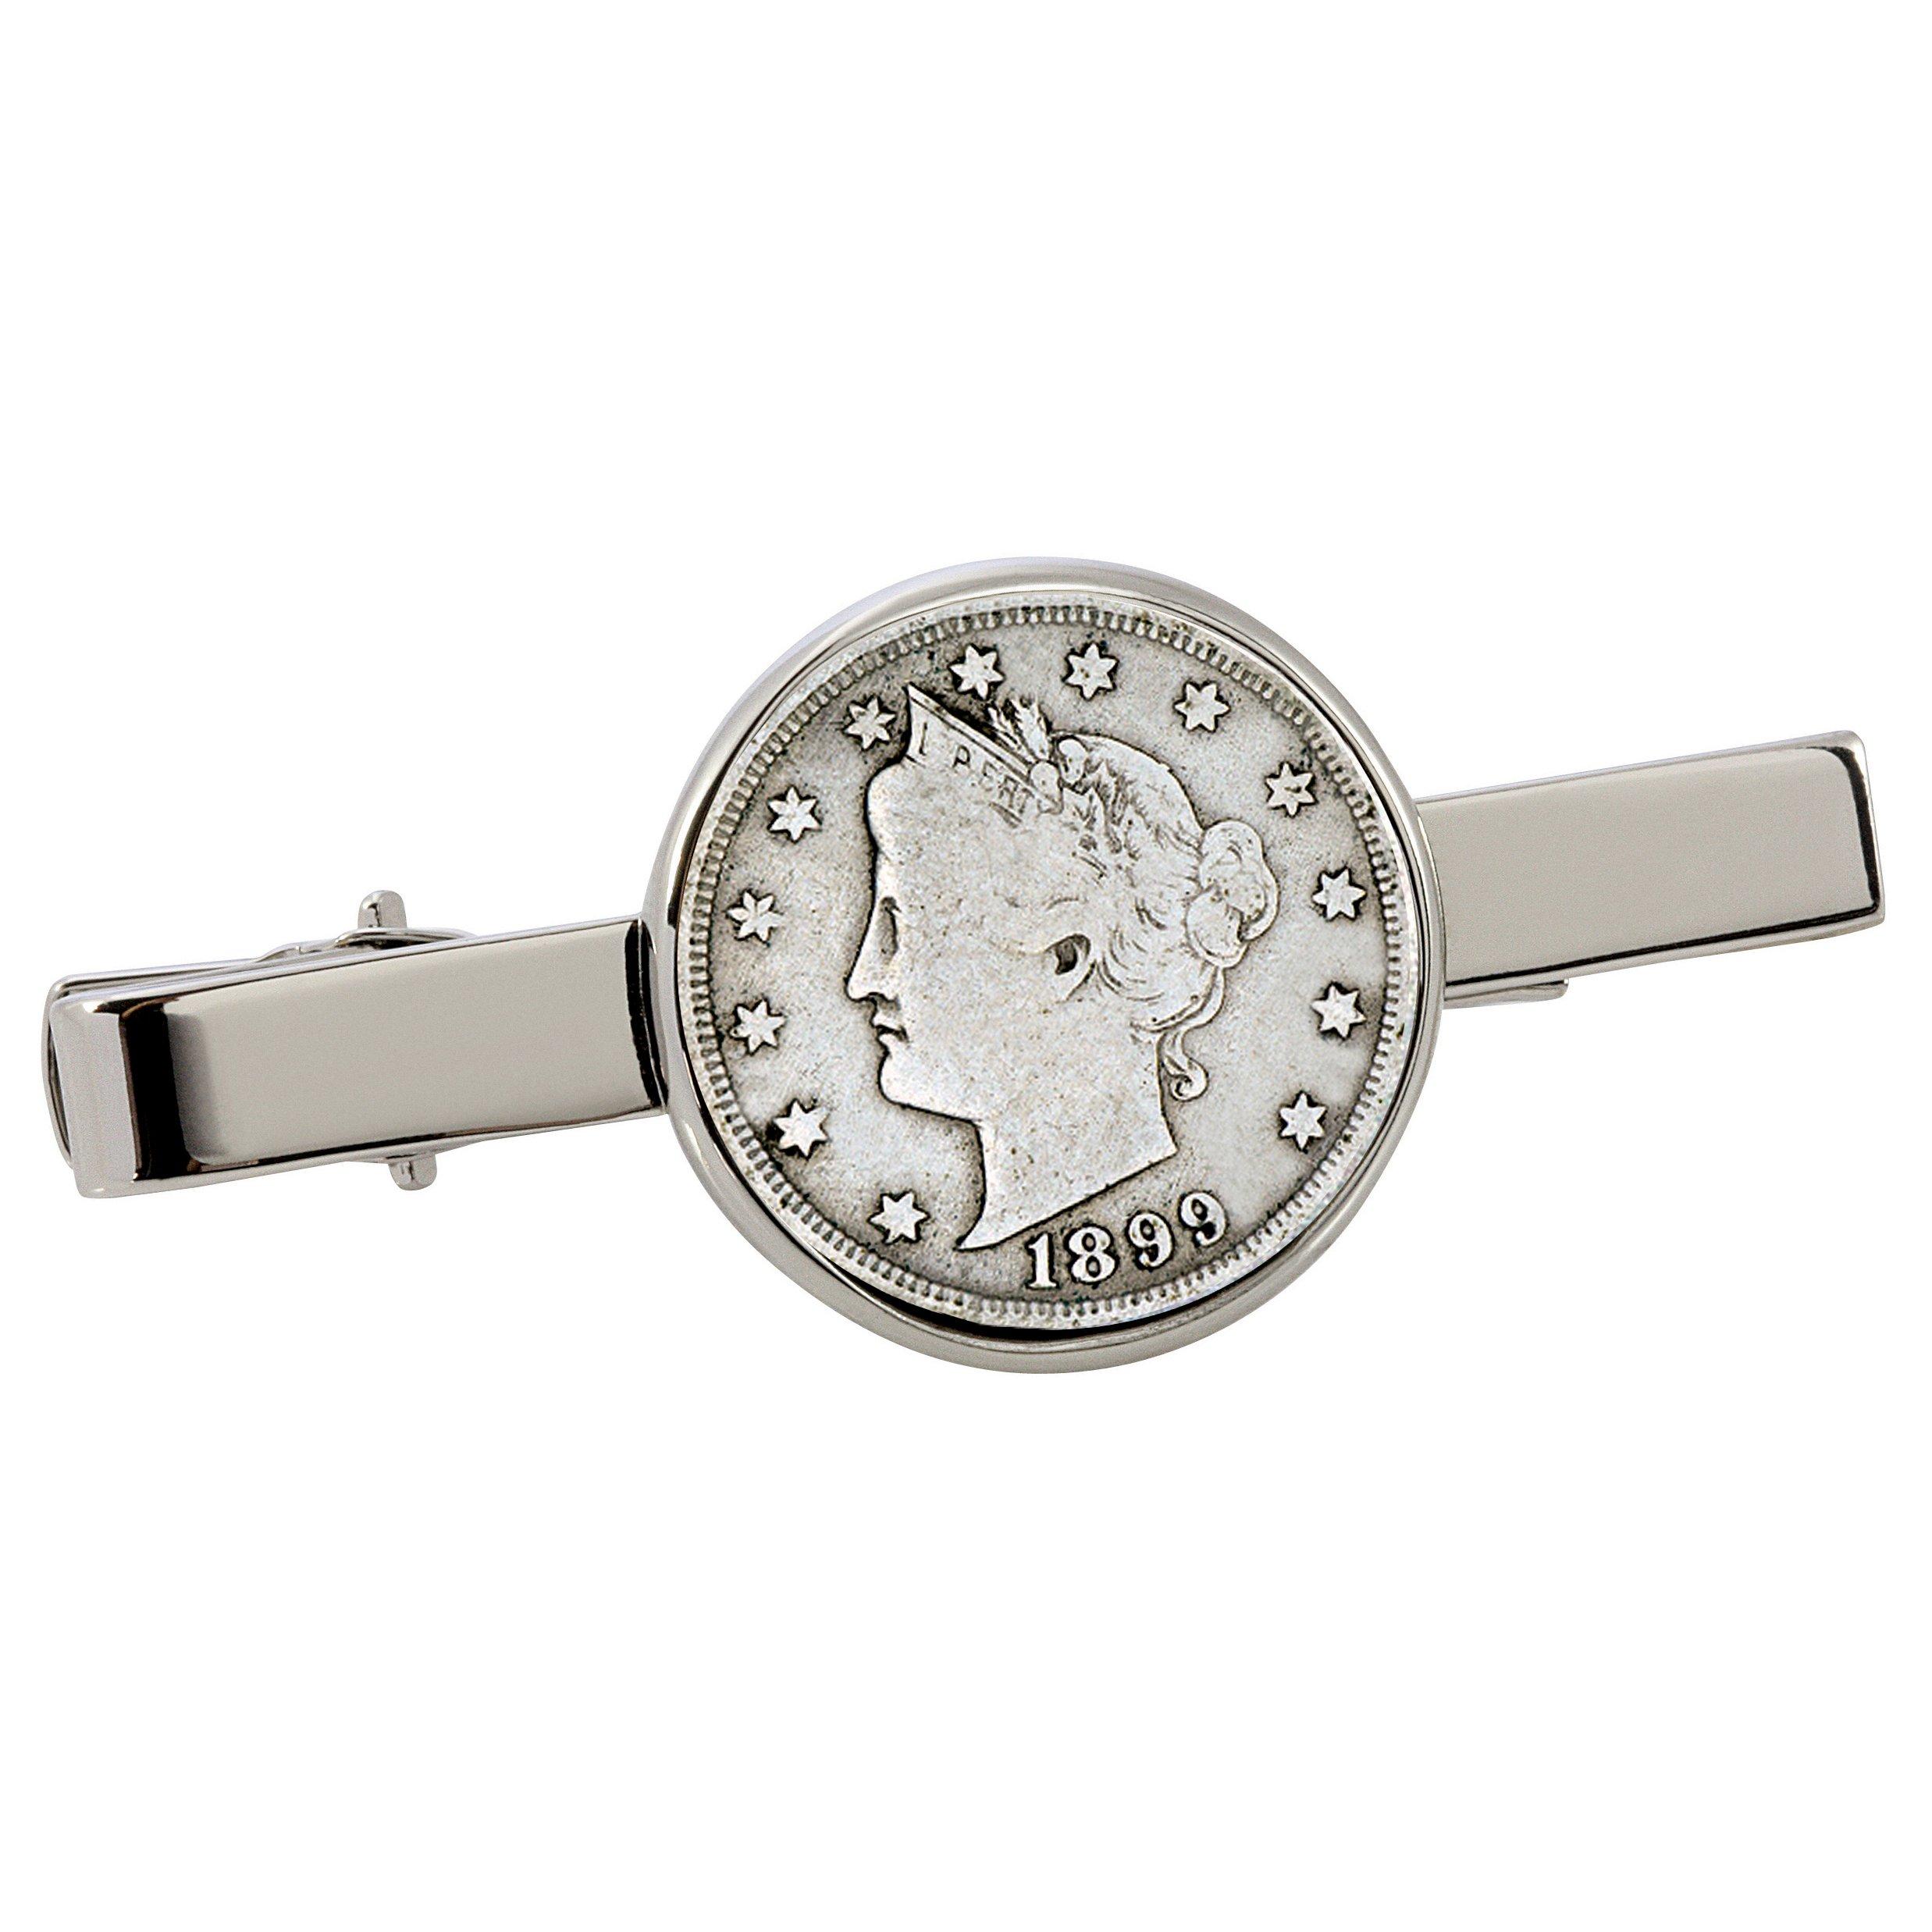 American Coin Treasures 1800's Liberty Nickel Silvertone Coin Tie Clip by American Coin Treasures (Image #1)